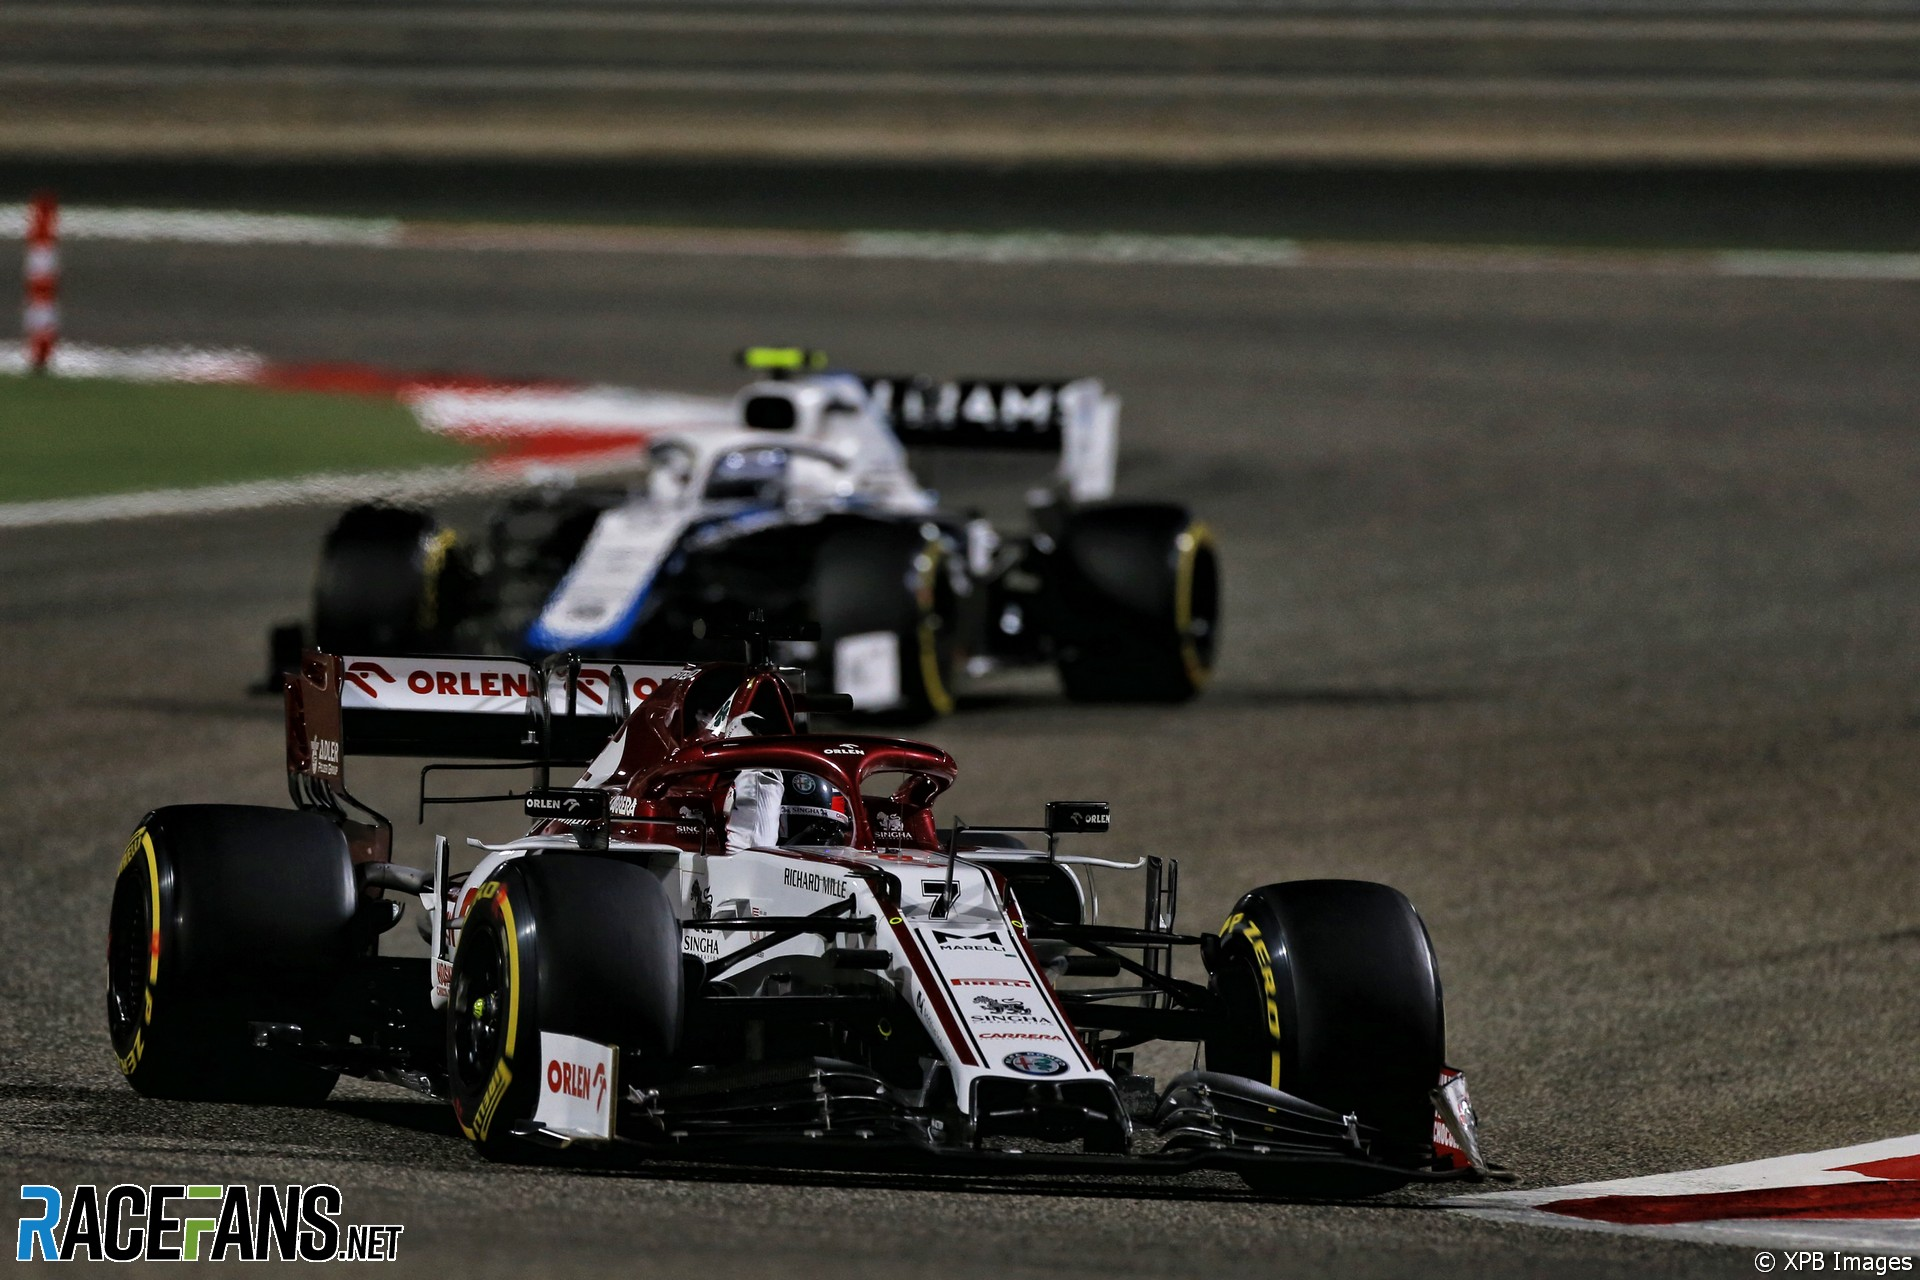 Kimi Raikkonen, Alfa Romeo, Bahrain International Circuit, 2020